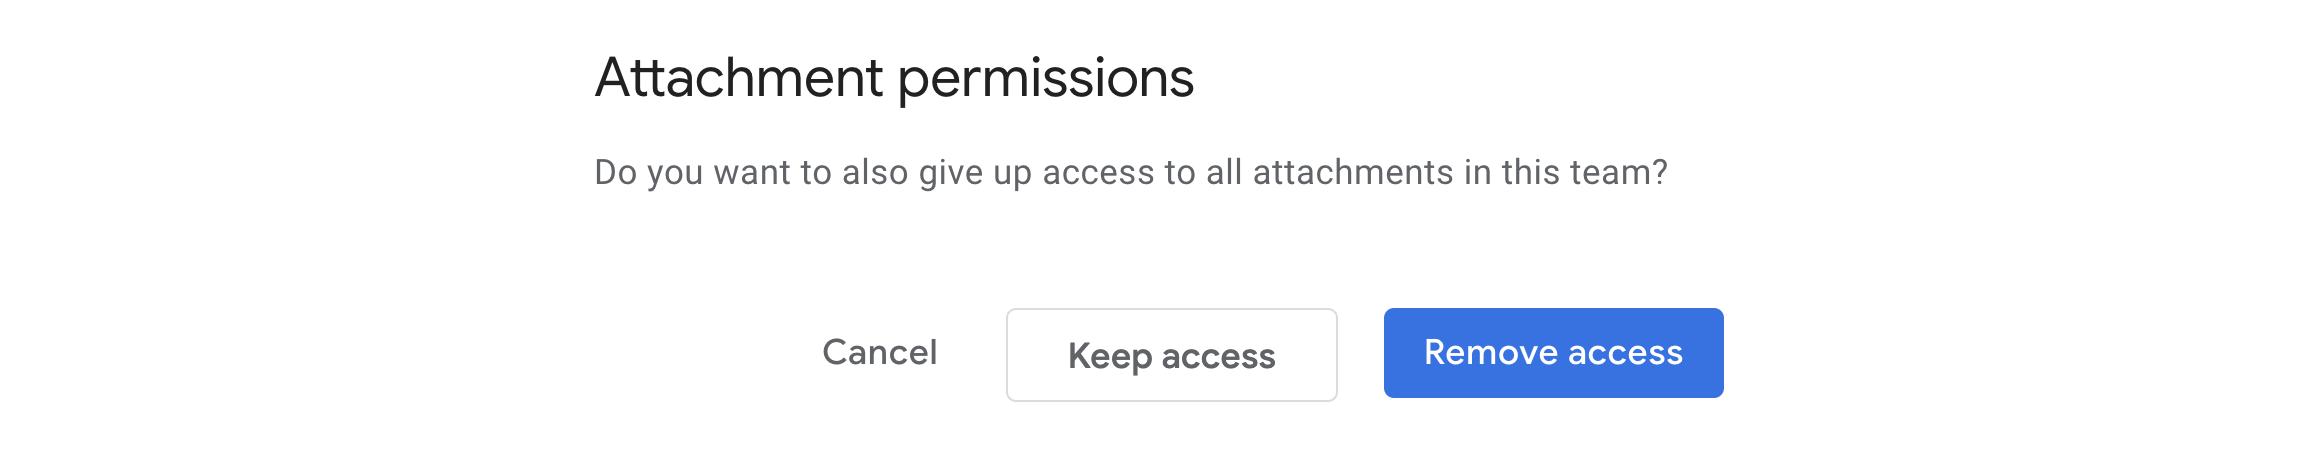 Confirm attachment permissions